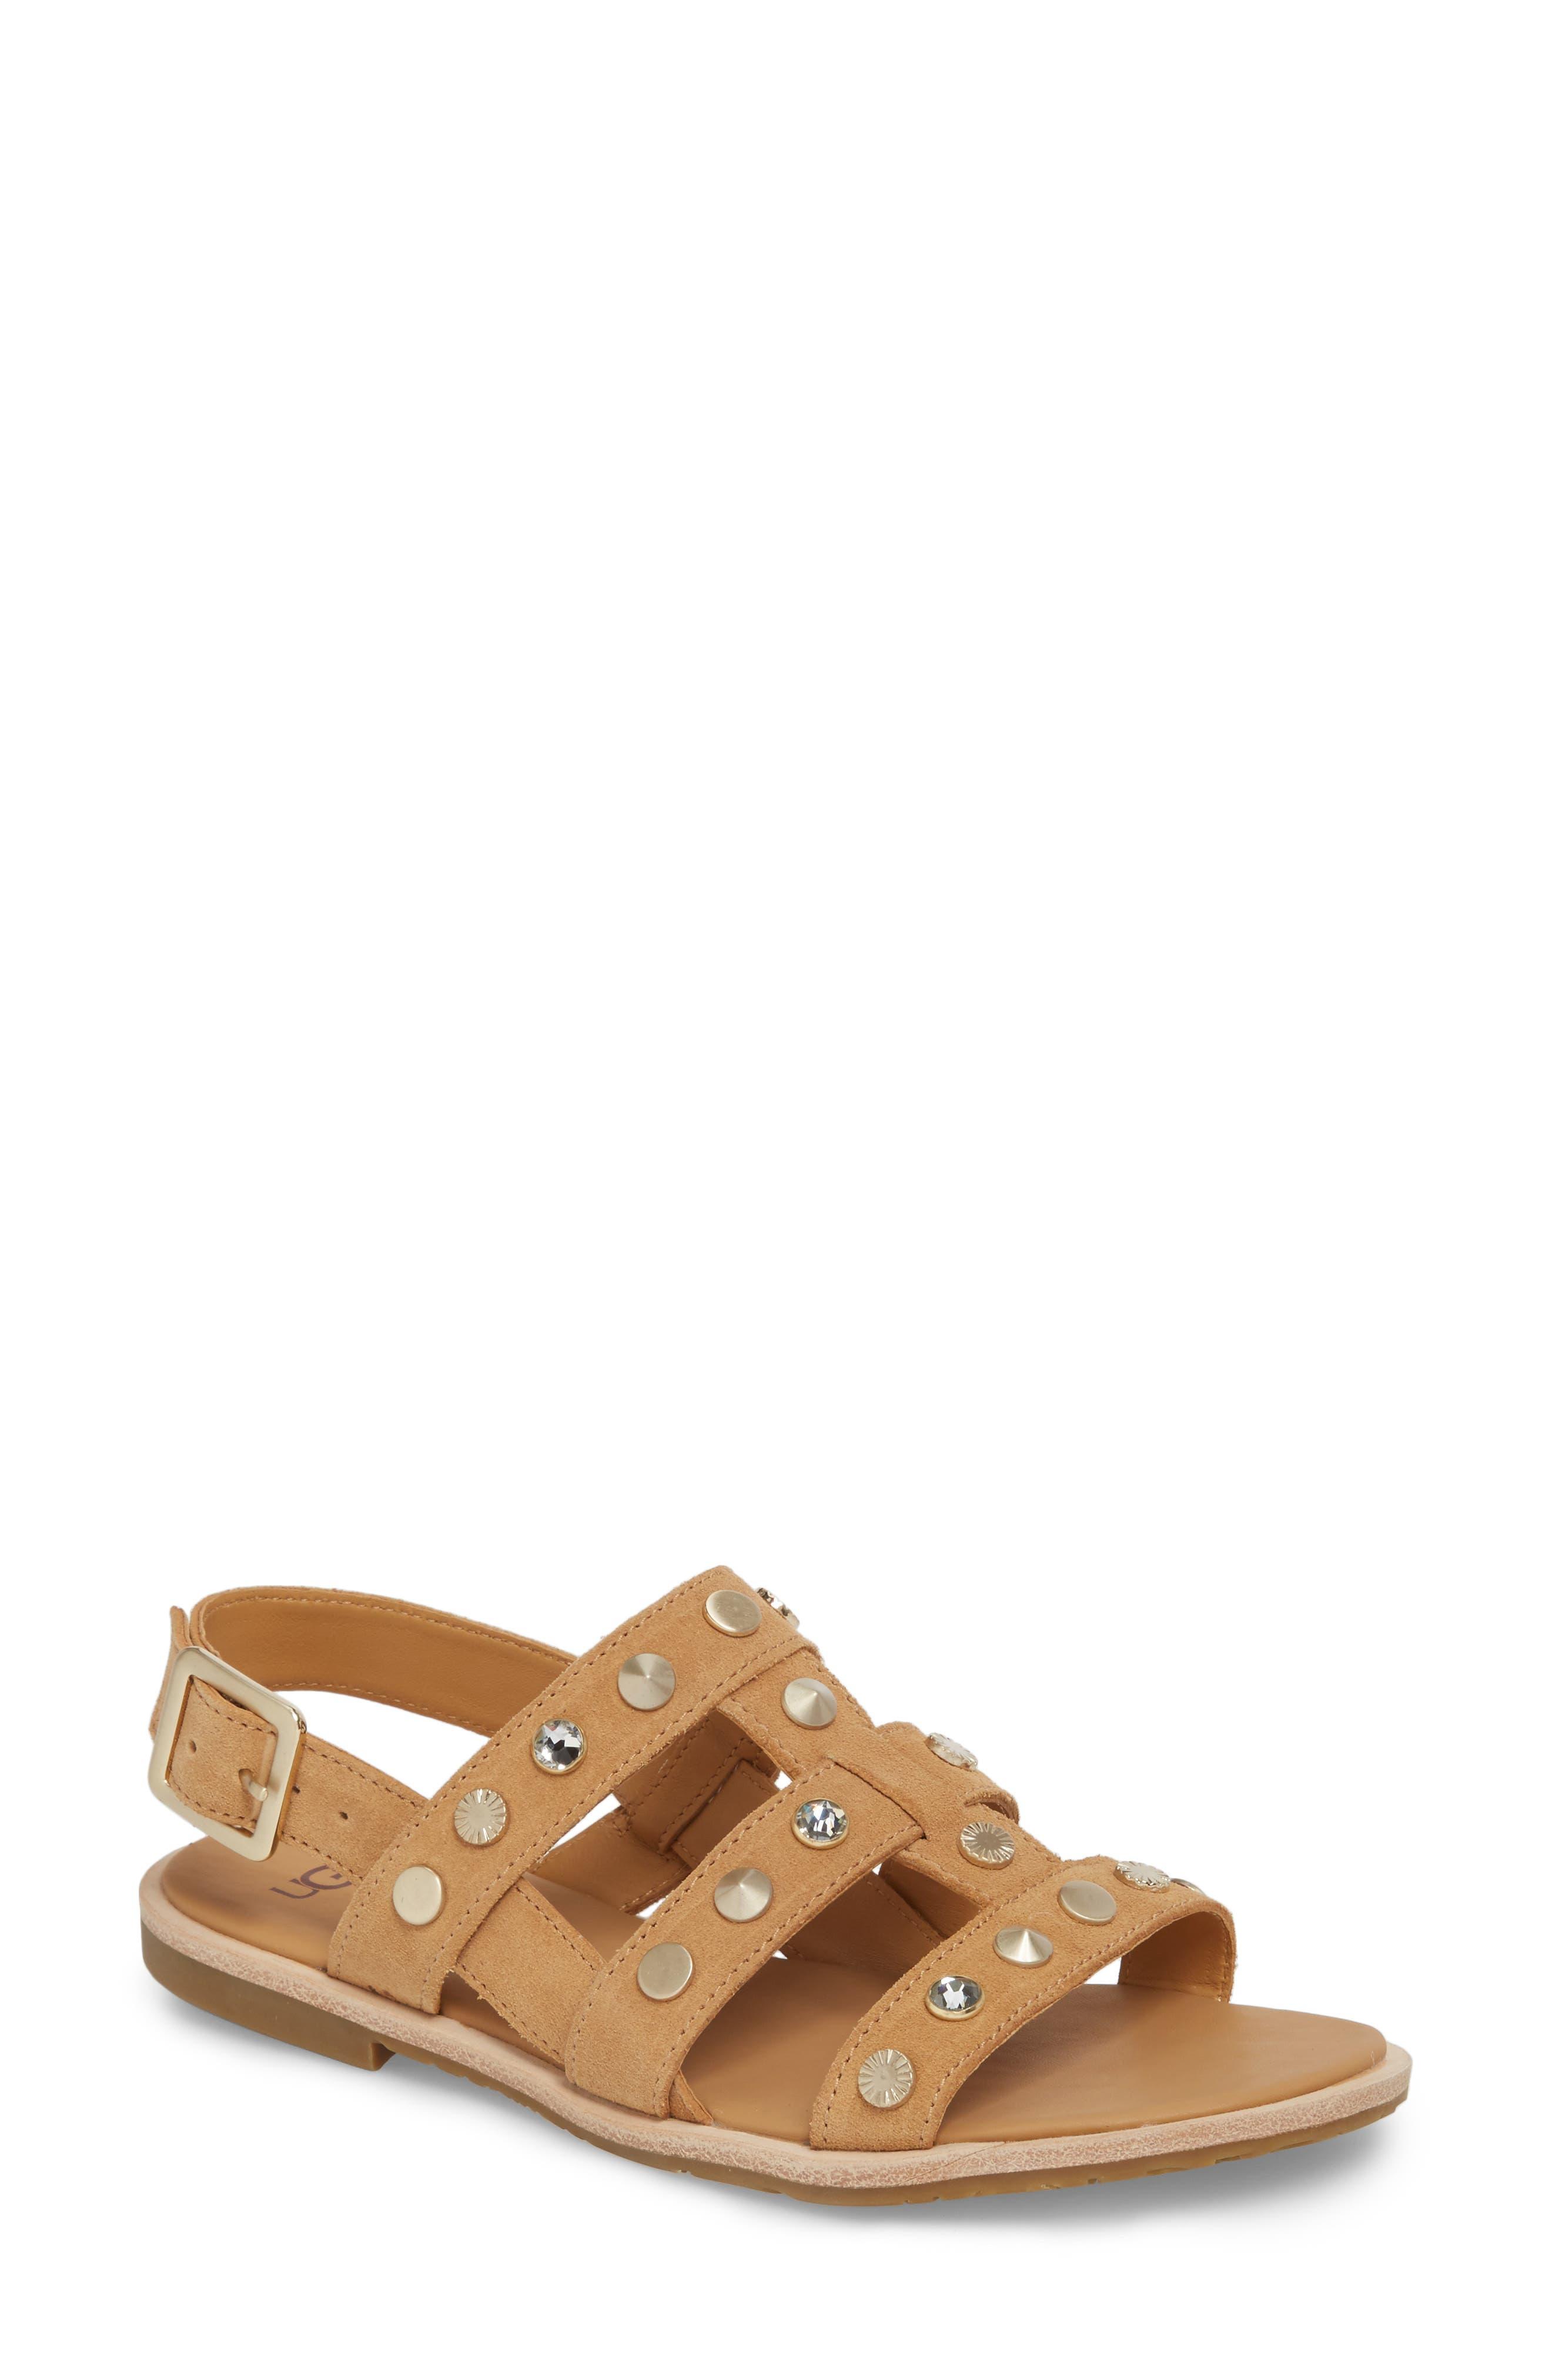 Zariah Studded Sandal,                         Main,                         color, Latte Suede